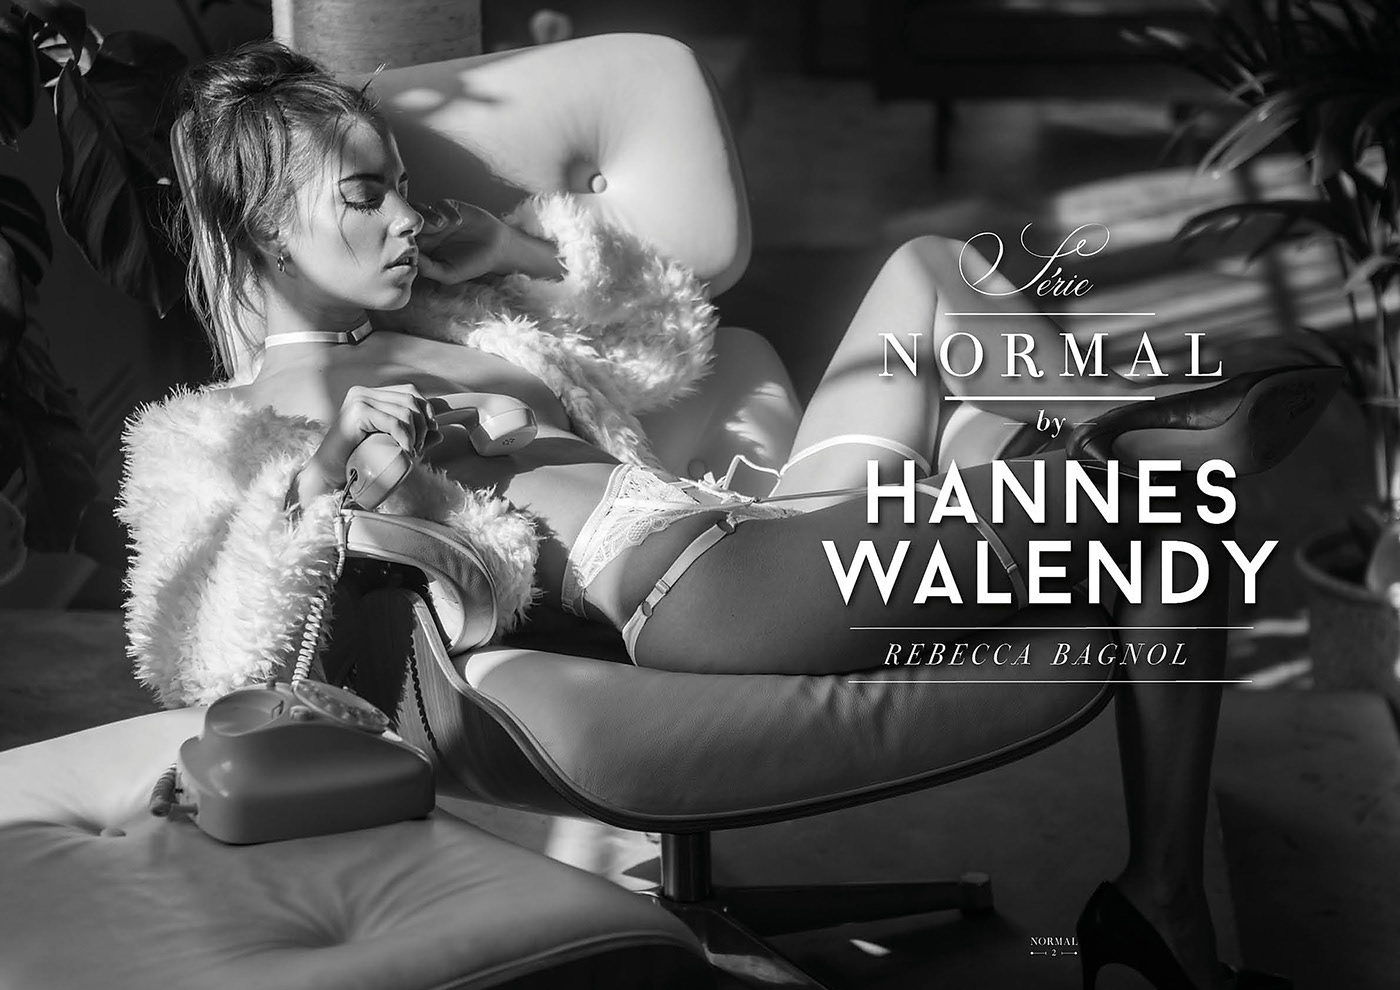 Rebecca Bagnol for Normal Magazine / фотограф Hannes Walendy